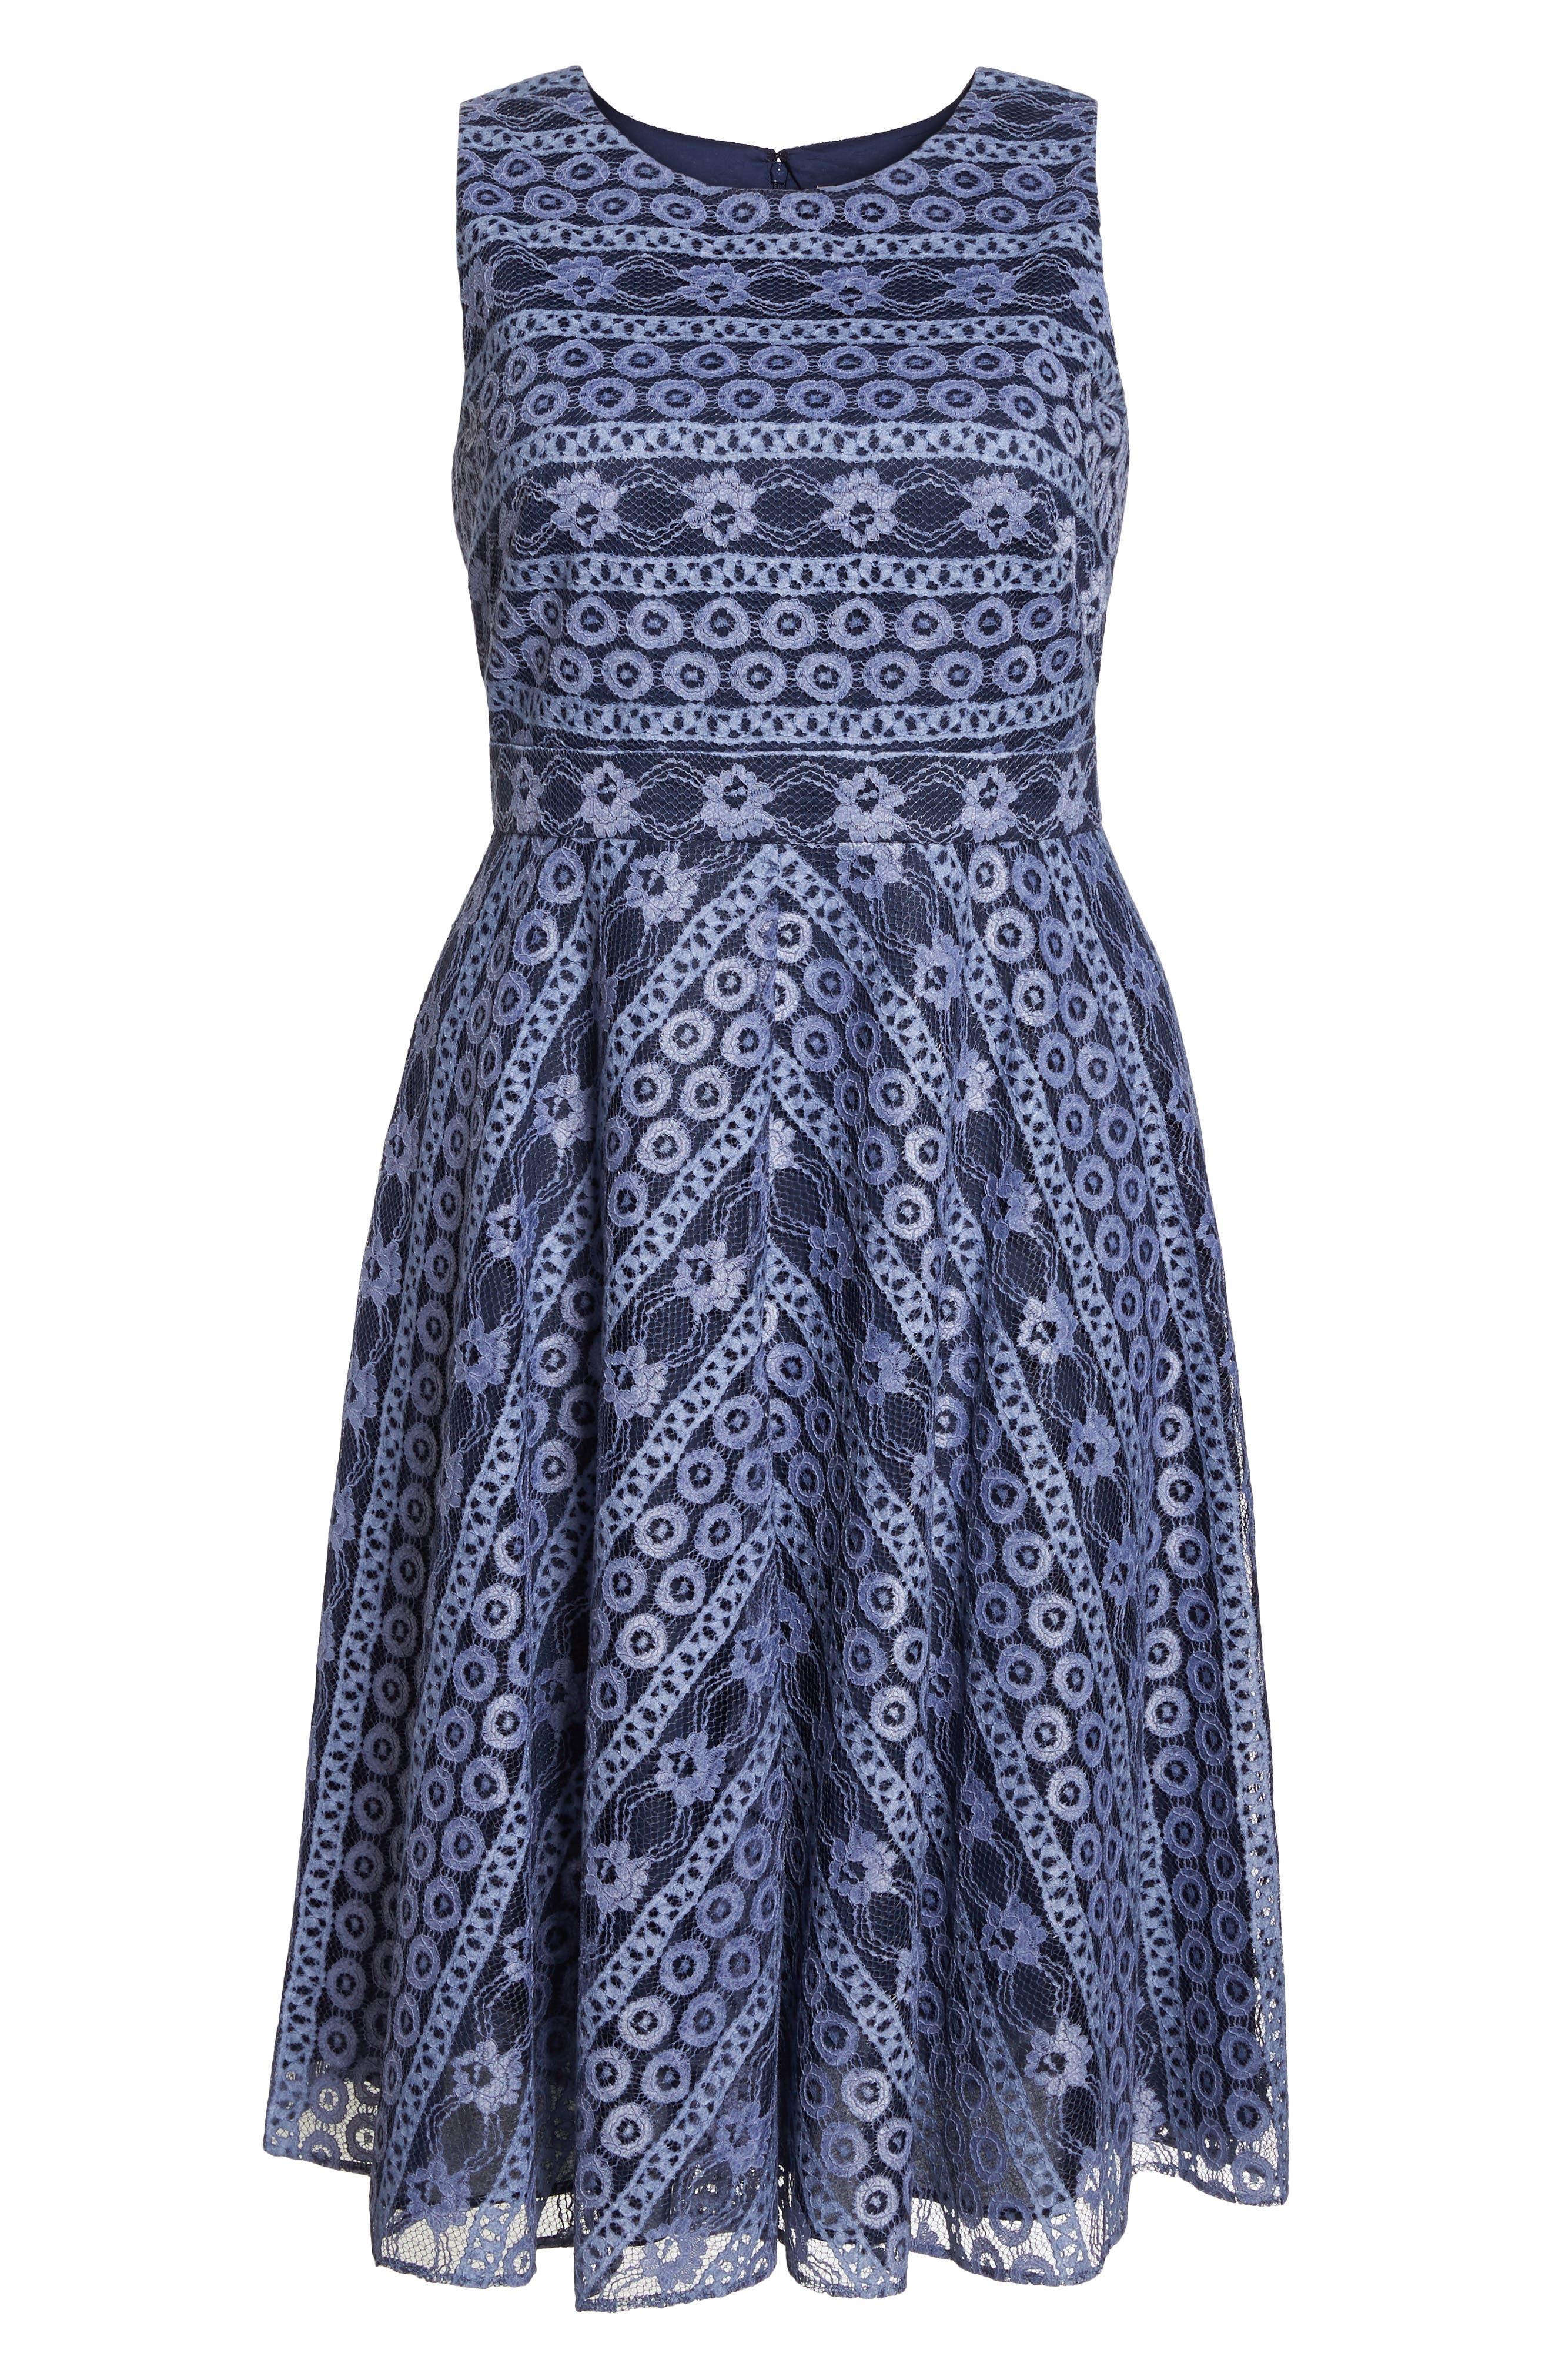 Stripe Lace A-Line Dress,                             Alternate thumbnail 7, color,                             Navy